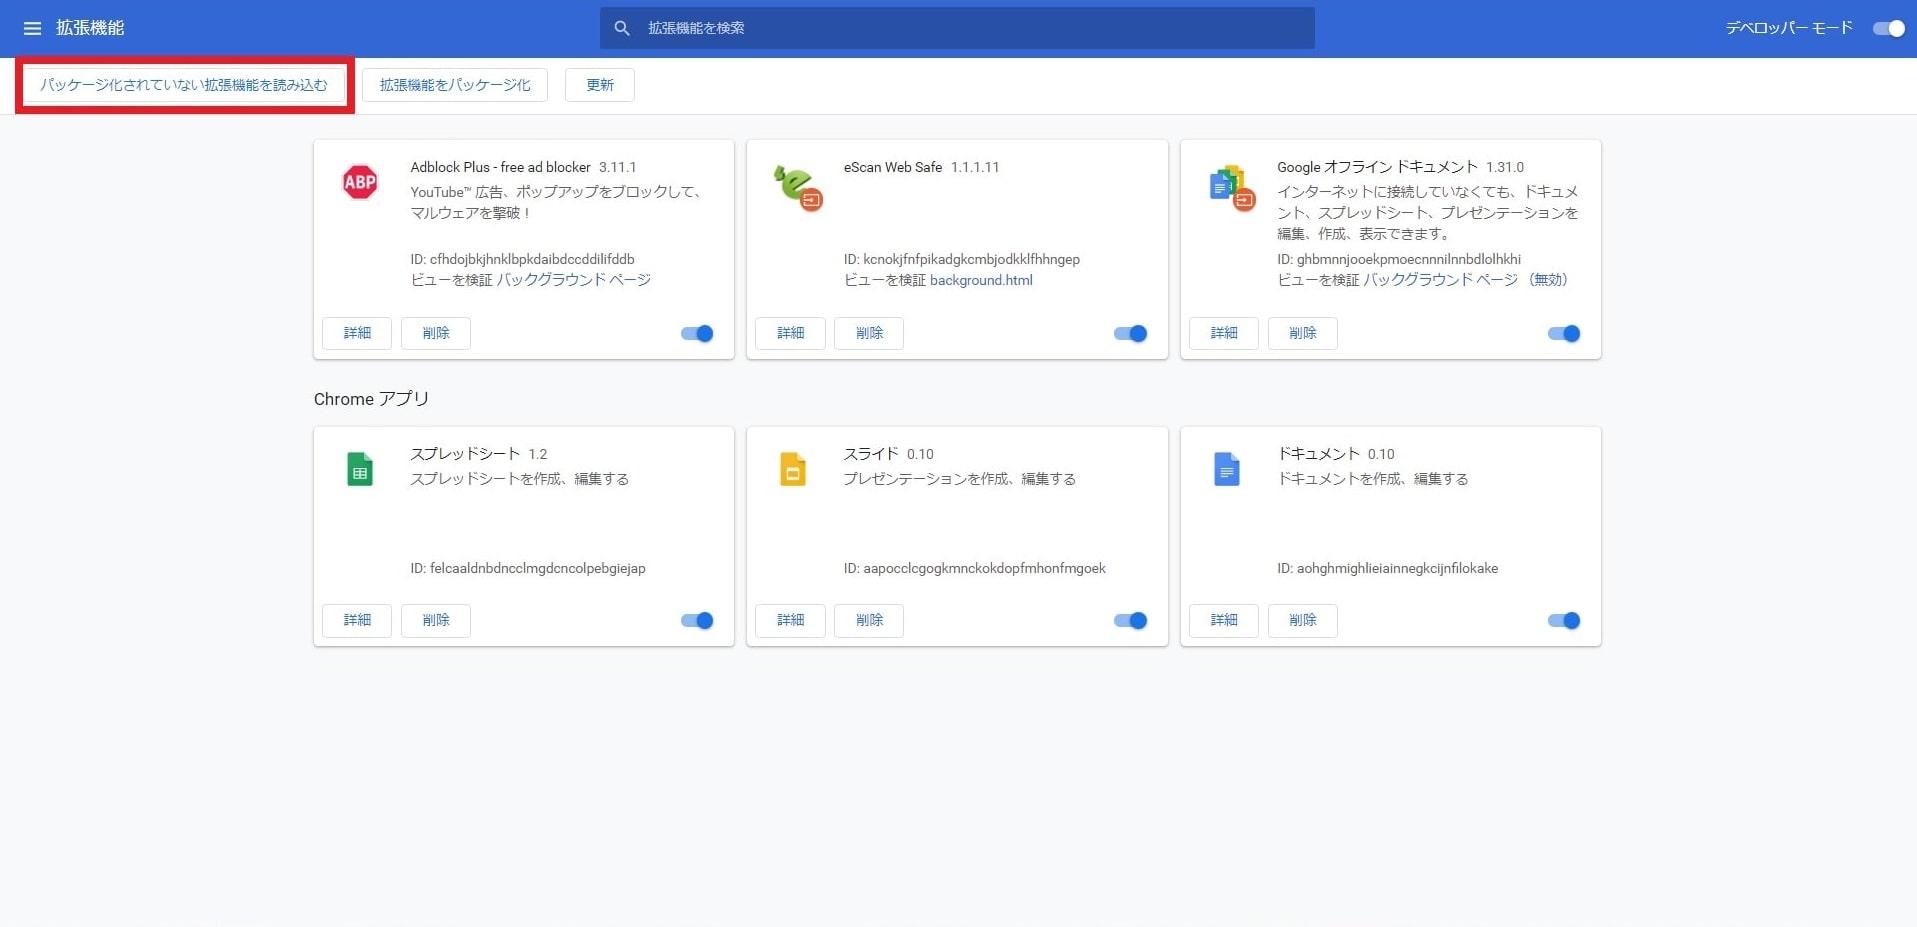 Google Chromeの拡張機能の管理画面